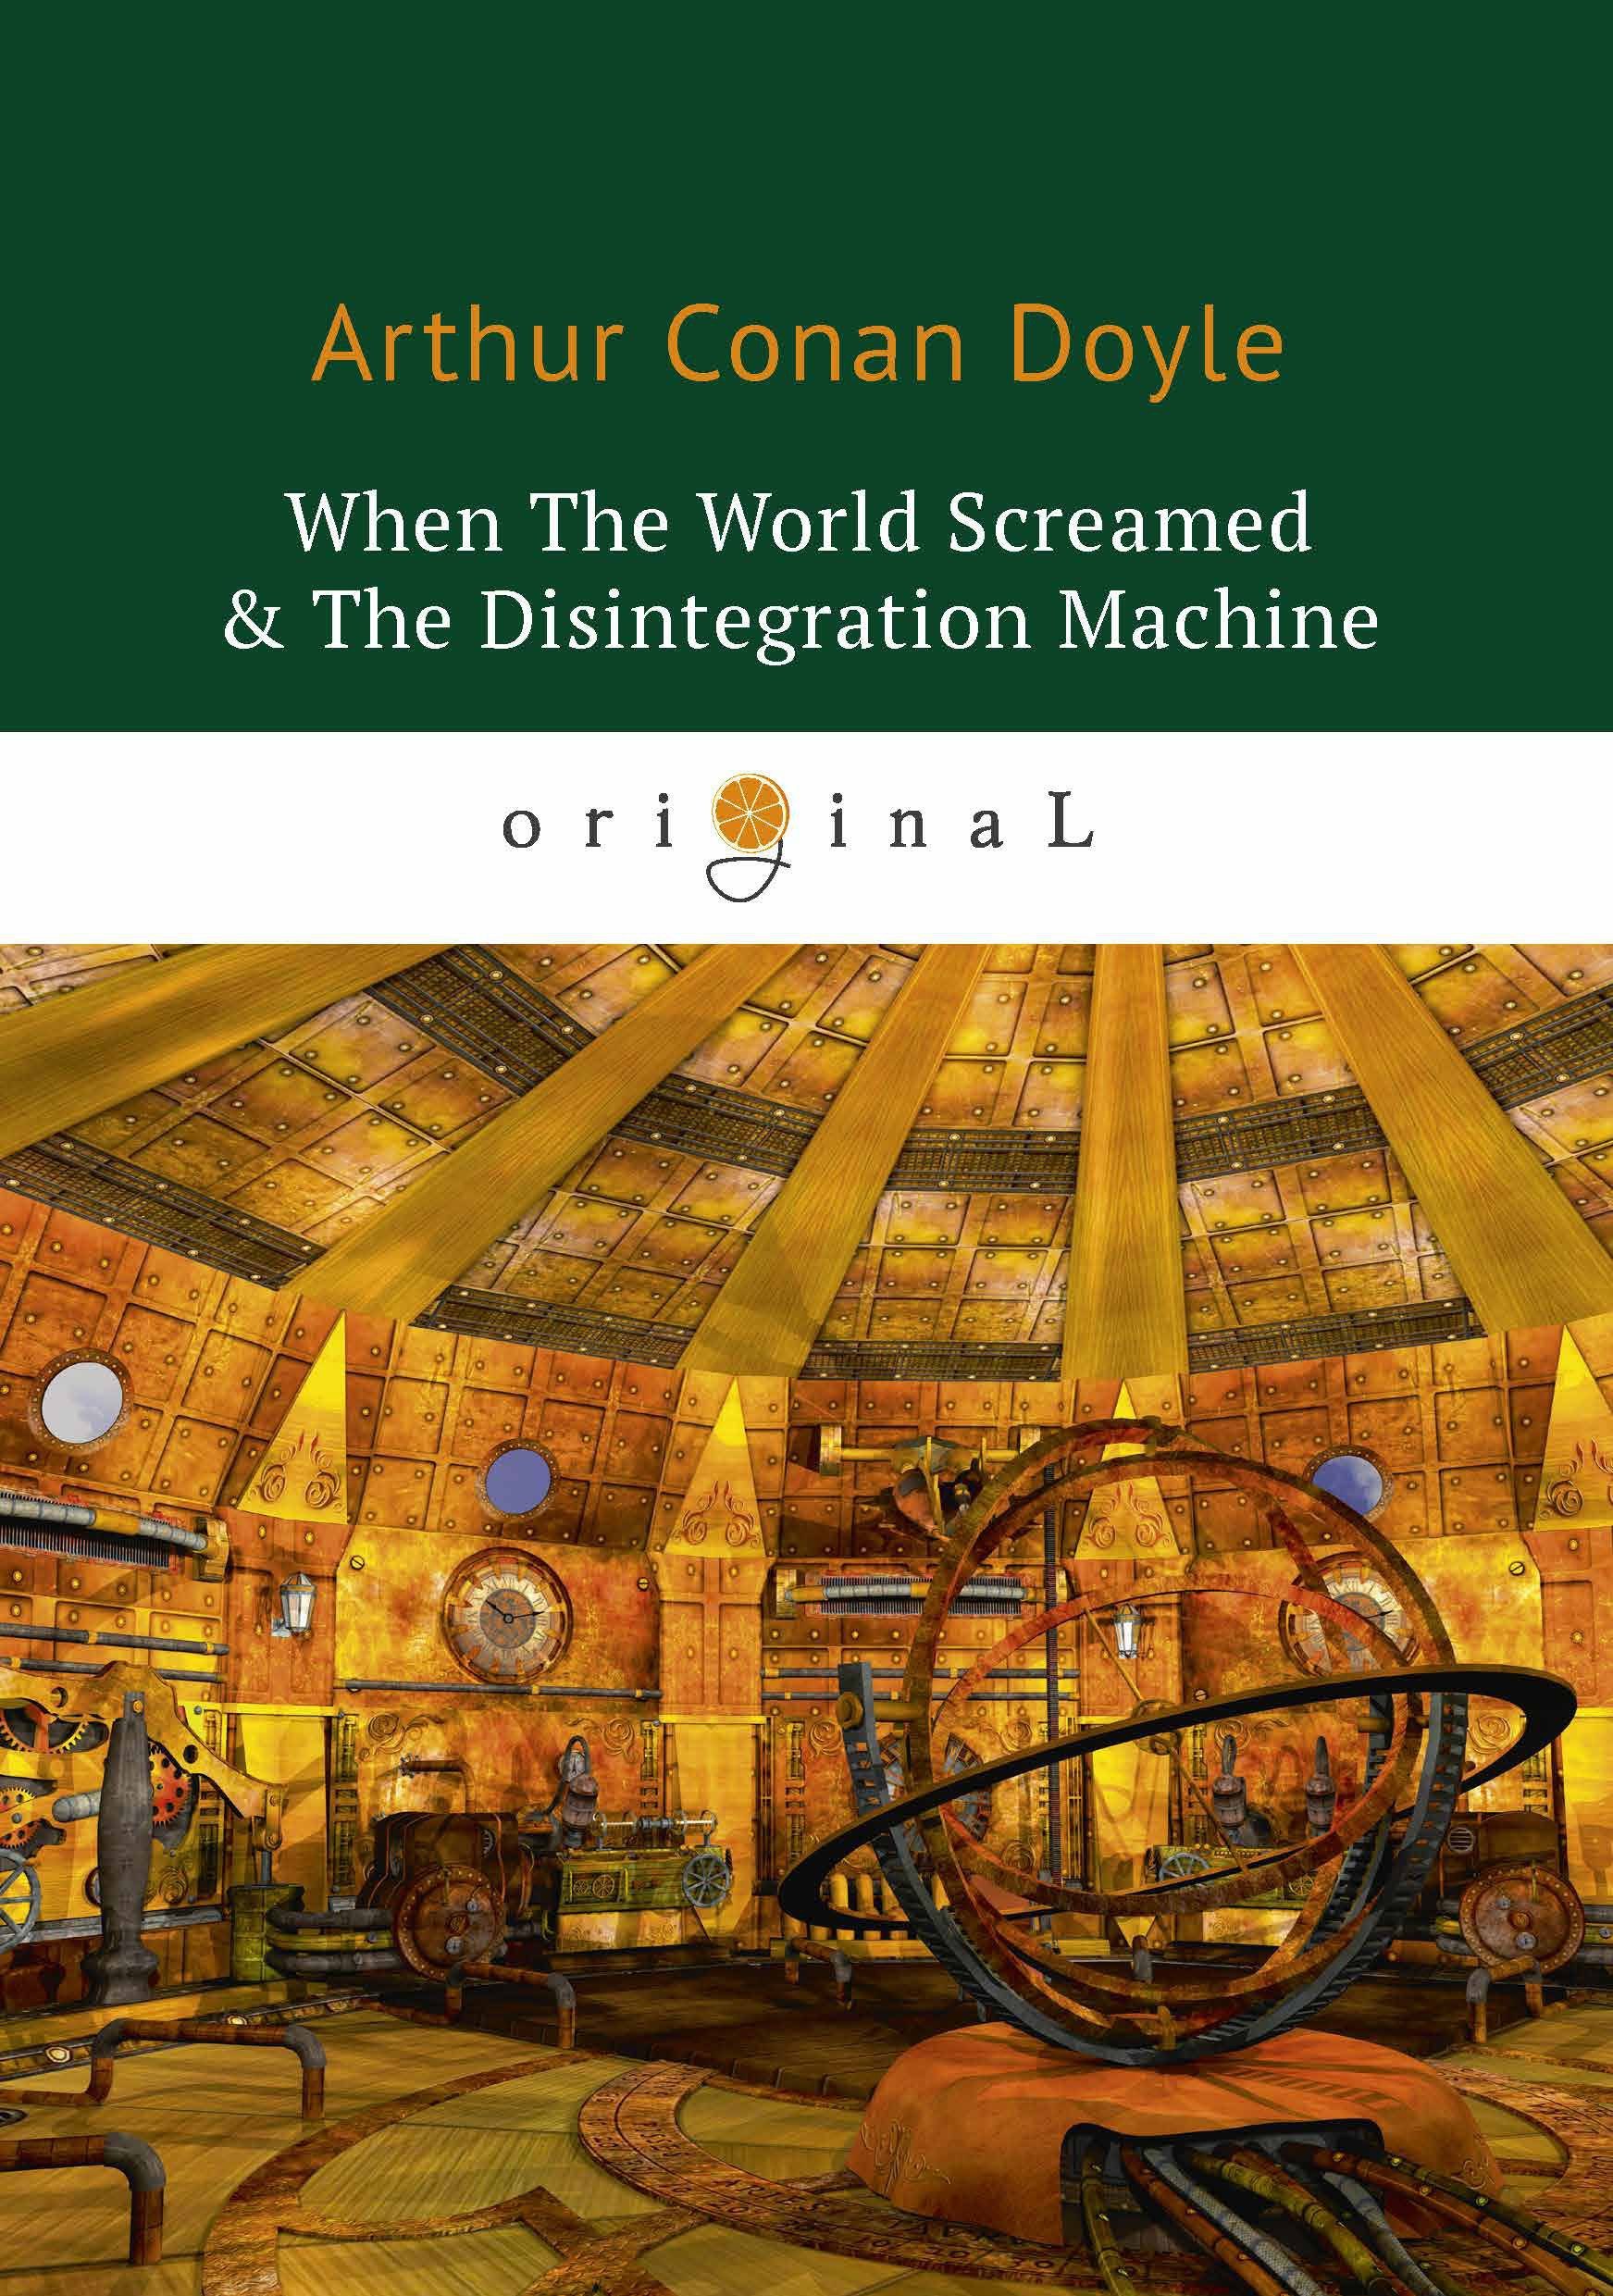 Дойл Артур Конан When The World Screamed & The Disintegration Machine = Когда Земля вскрикнула и Дезинтеграционная машина: на англ.яз недорого